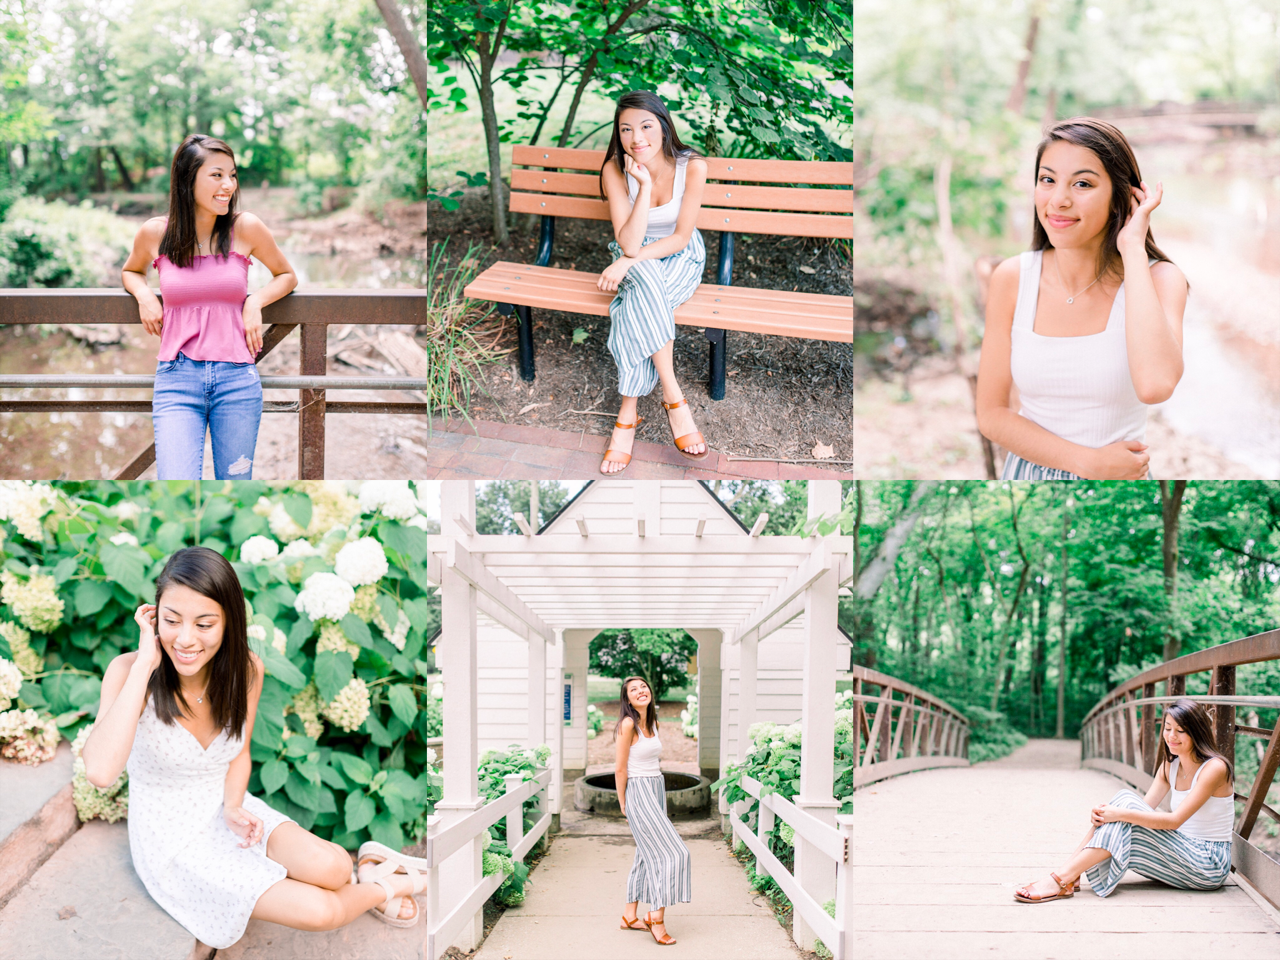 Marin | Carmel High School Senior Photography Session | Noblesville, IN Photographer